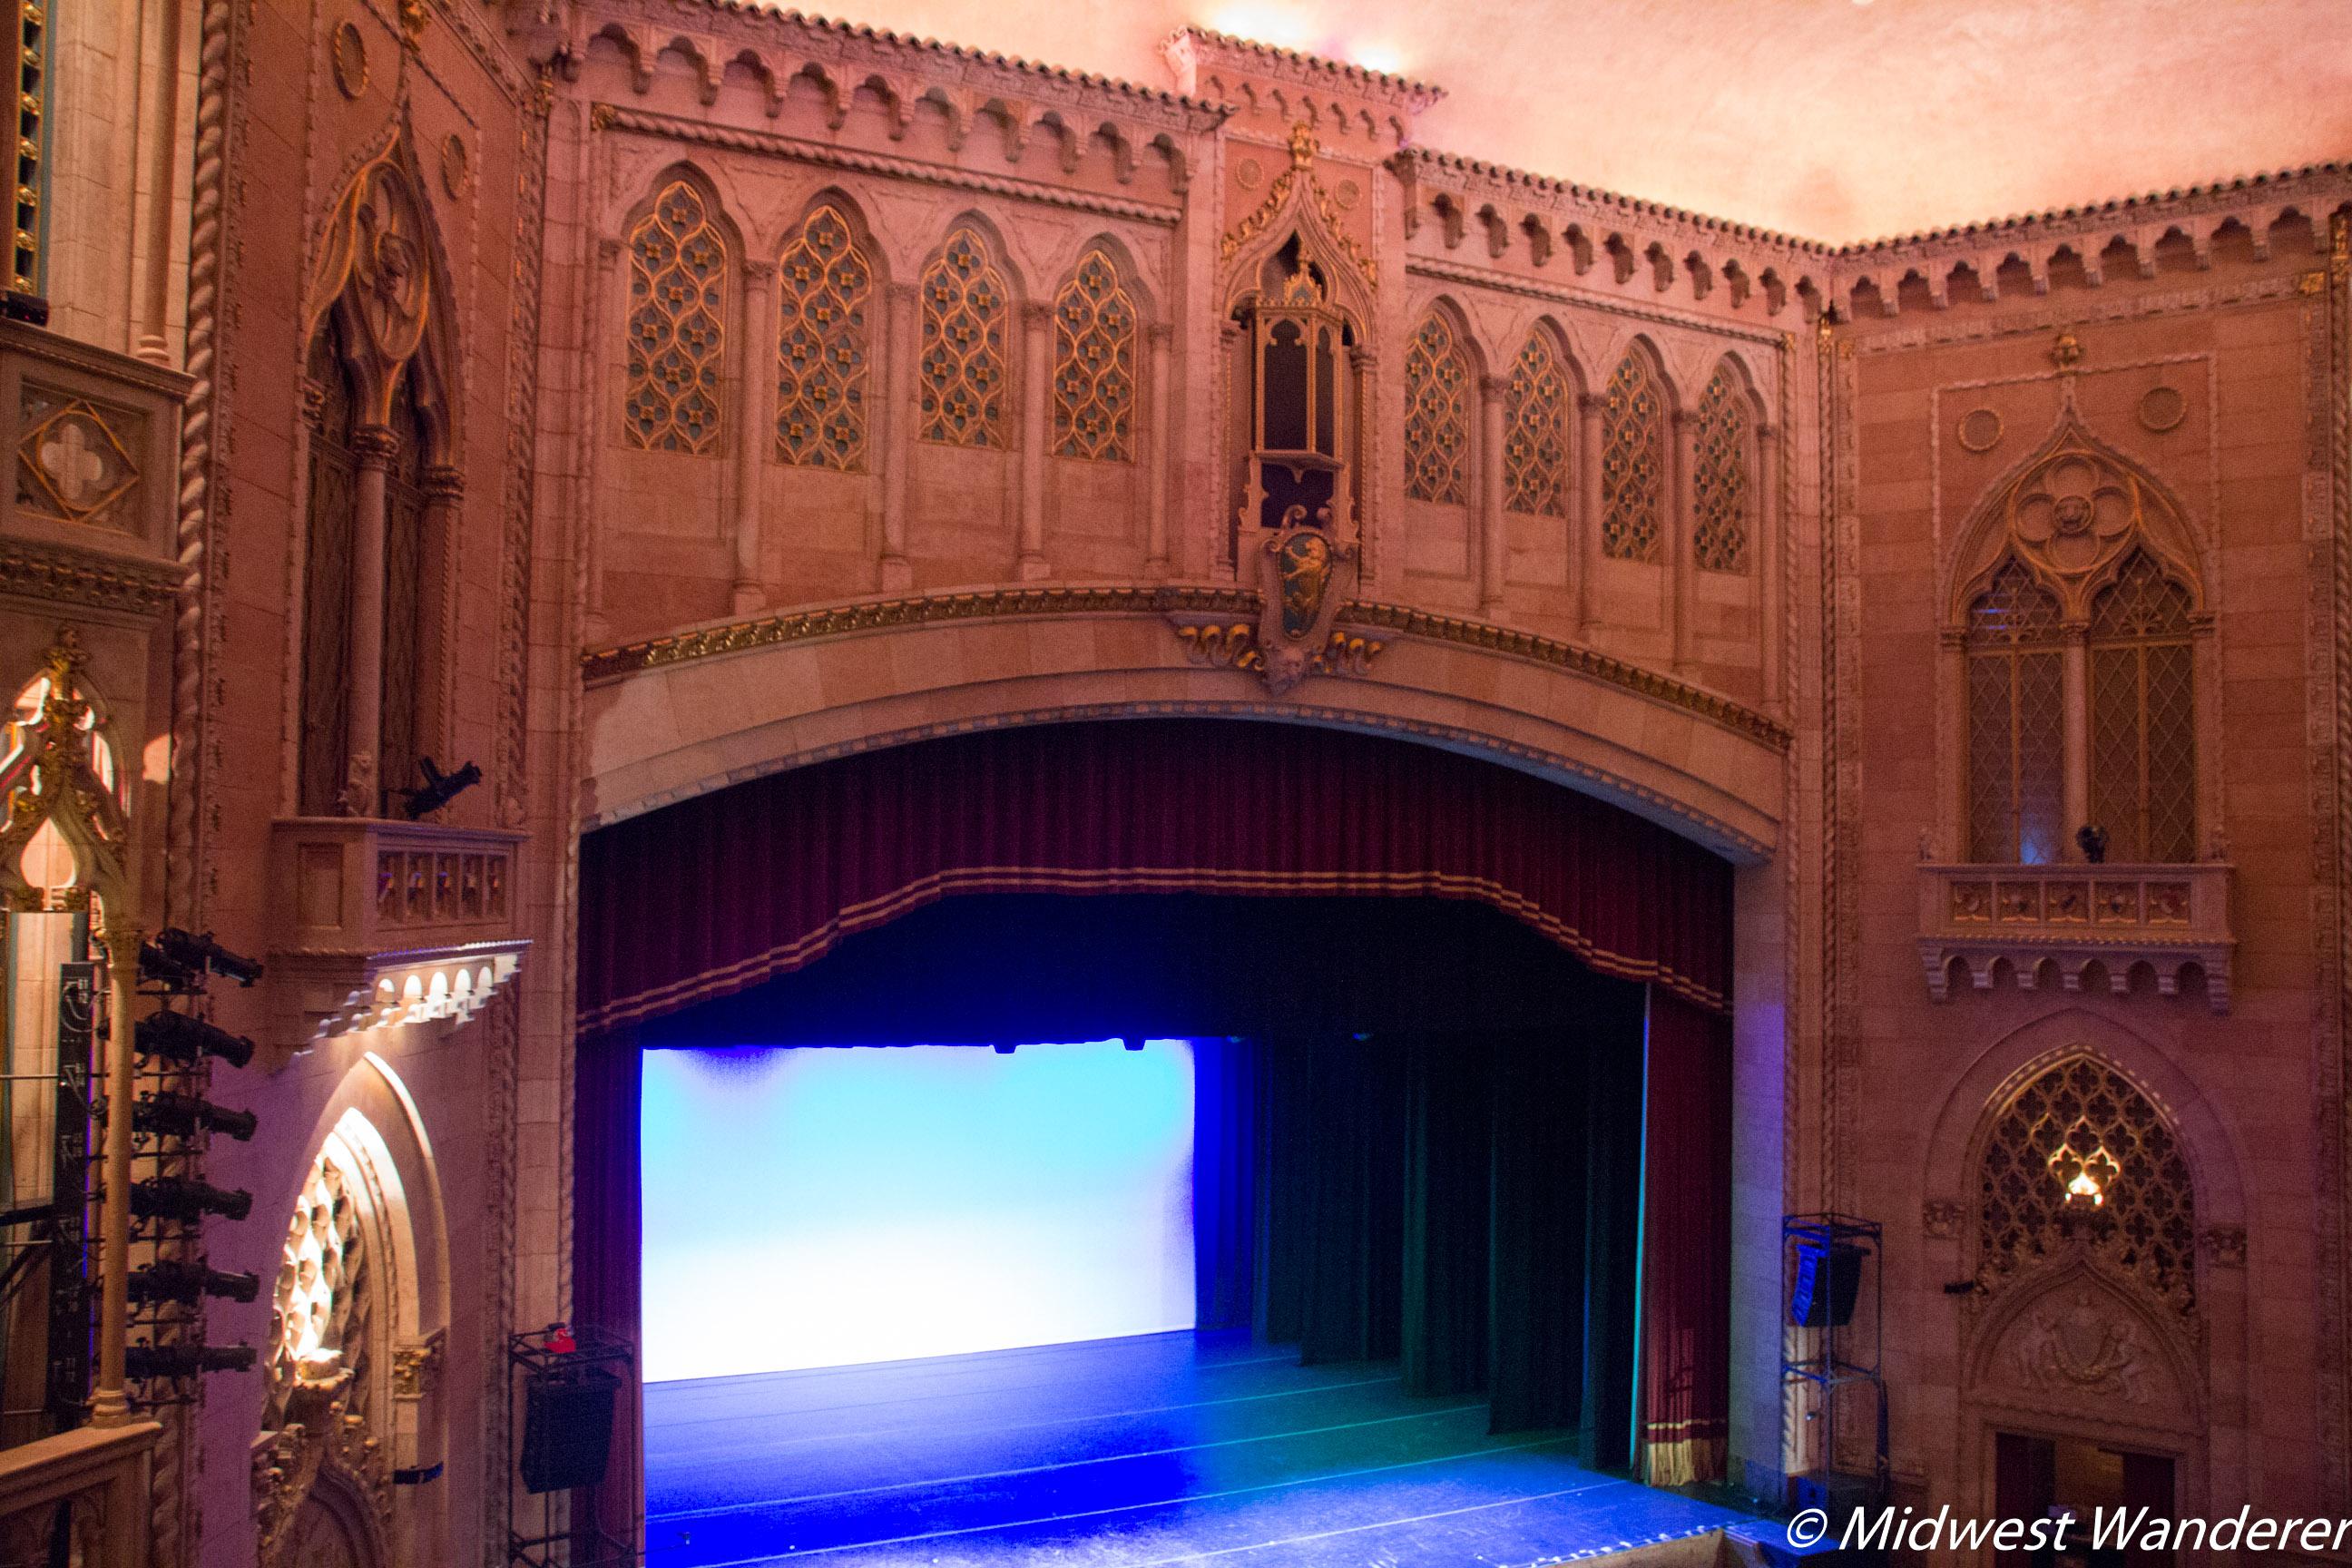 Hershey Theatre Lower Balcony View 2